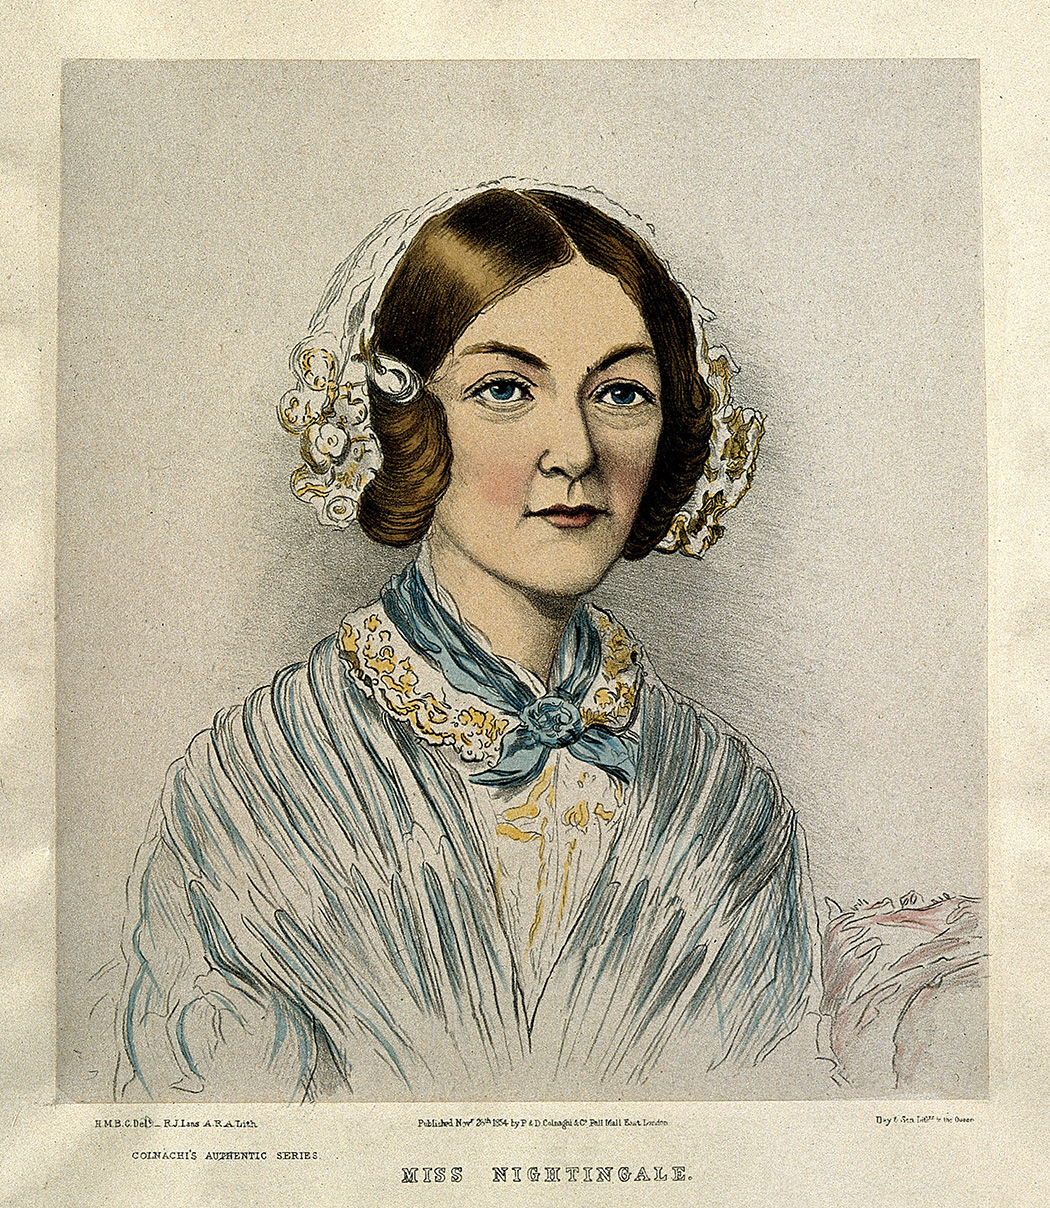 Florence Nightingale by H. M. Bonham-Carter, 1854